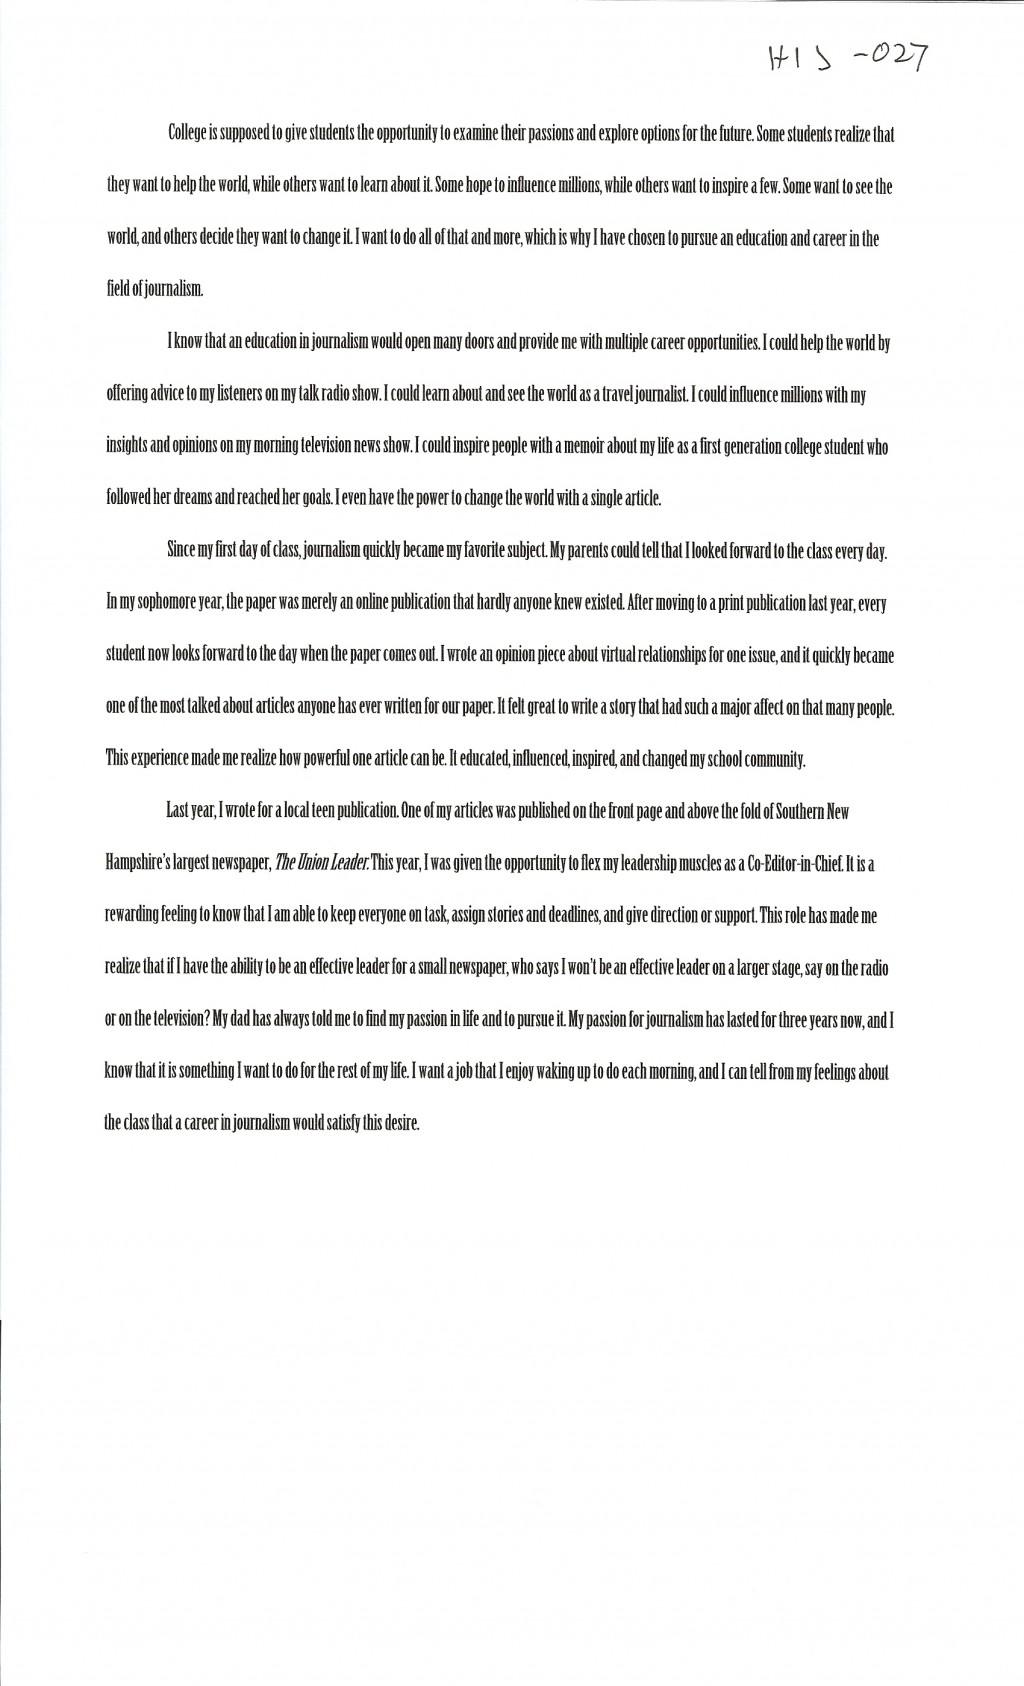 013 Alexa Serrecchia Essays Of Profile Marvelous Examples College Community Company Large